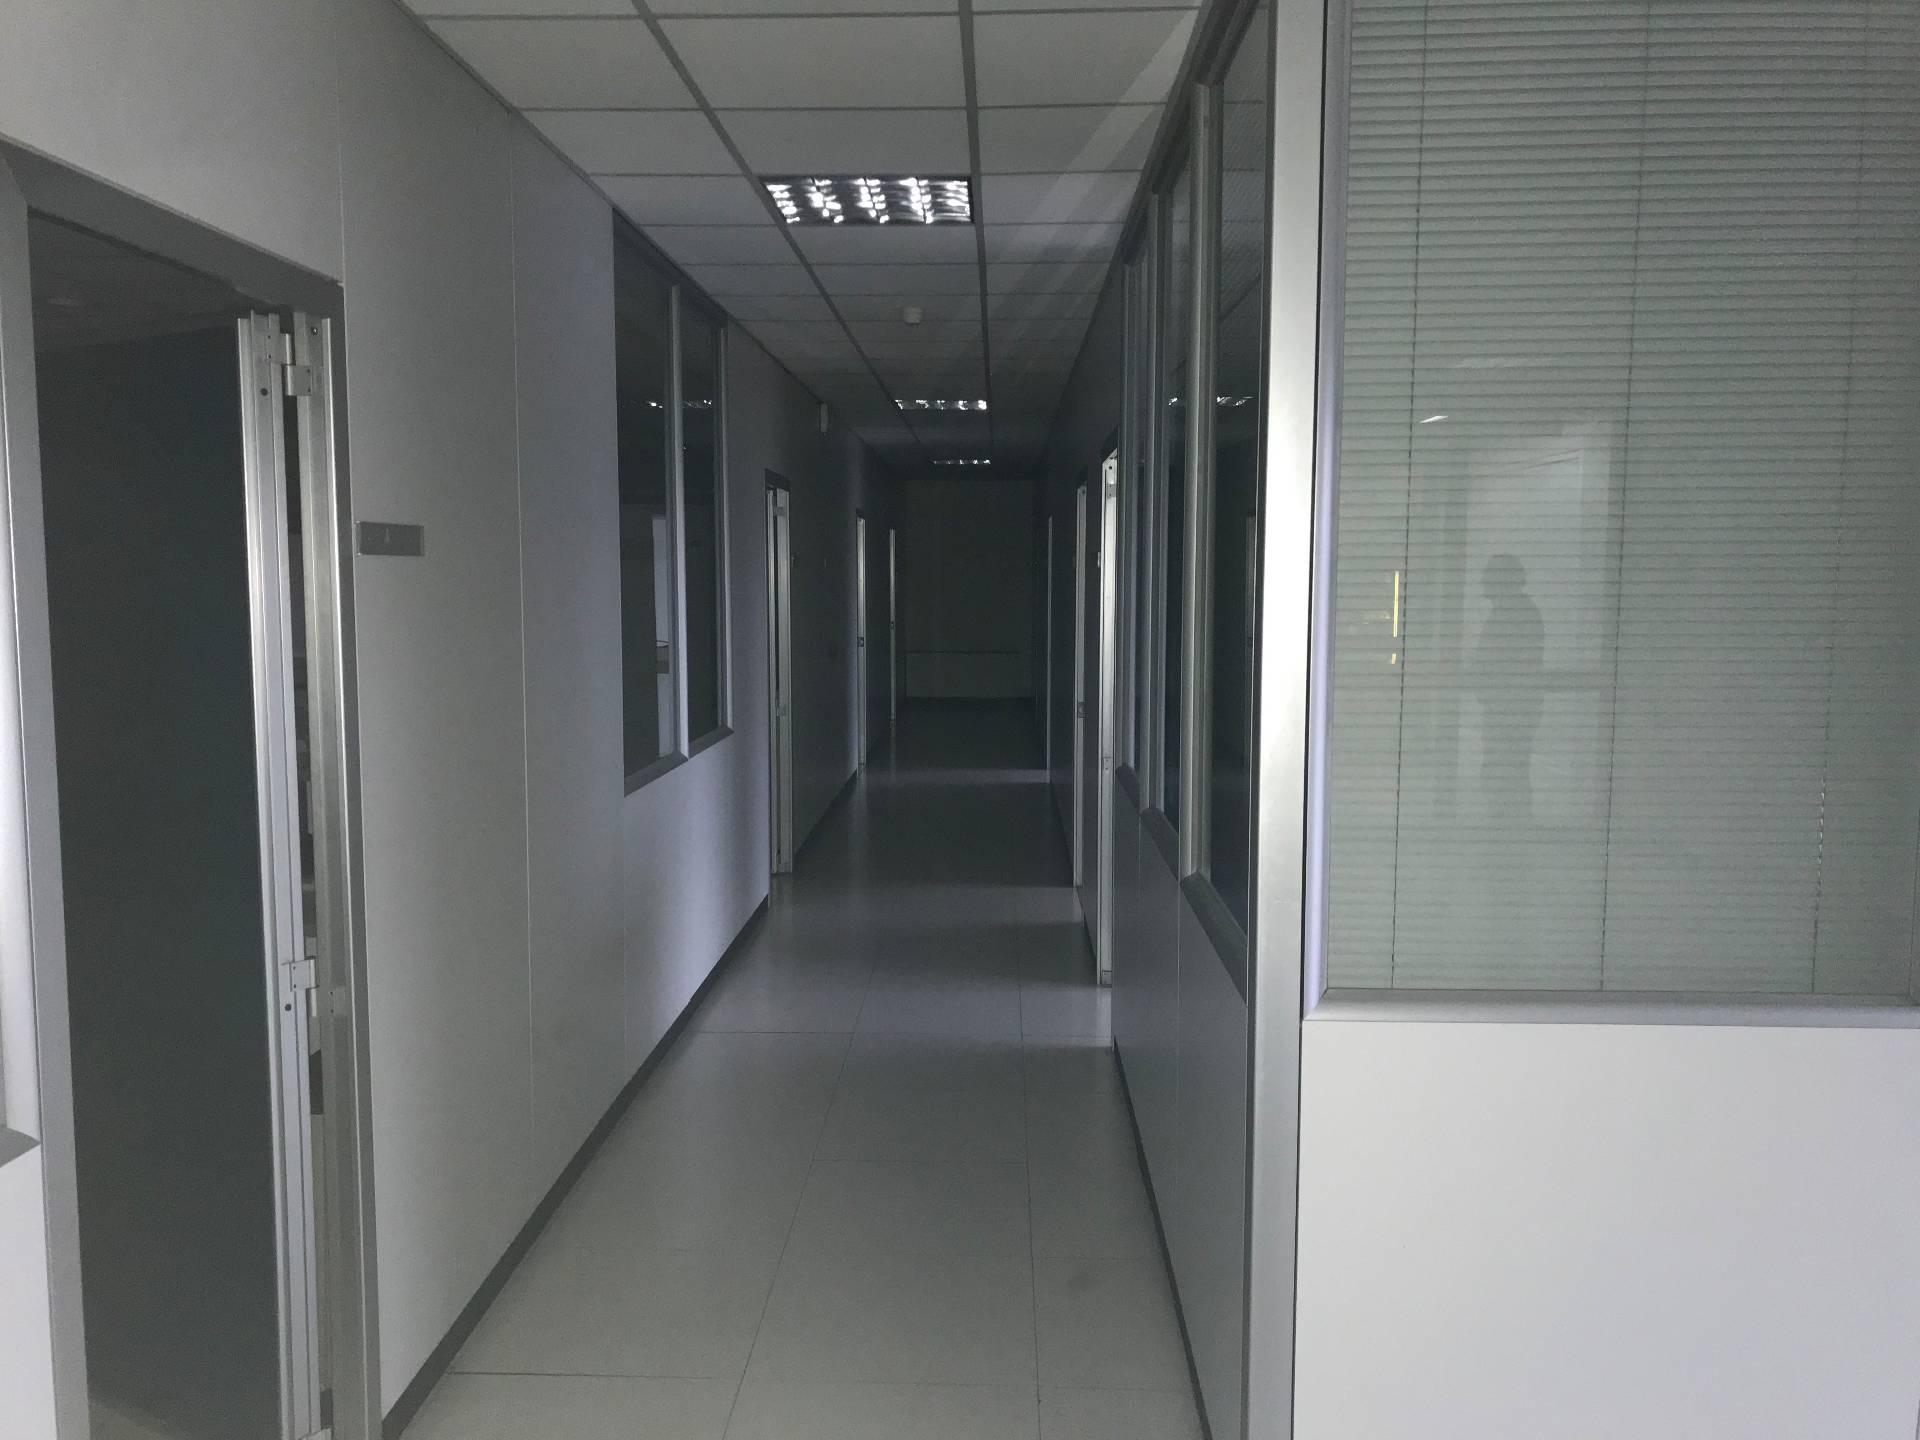 Ufficio a Empoli - santa maria - 01